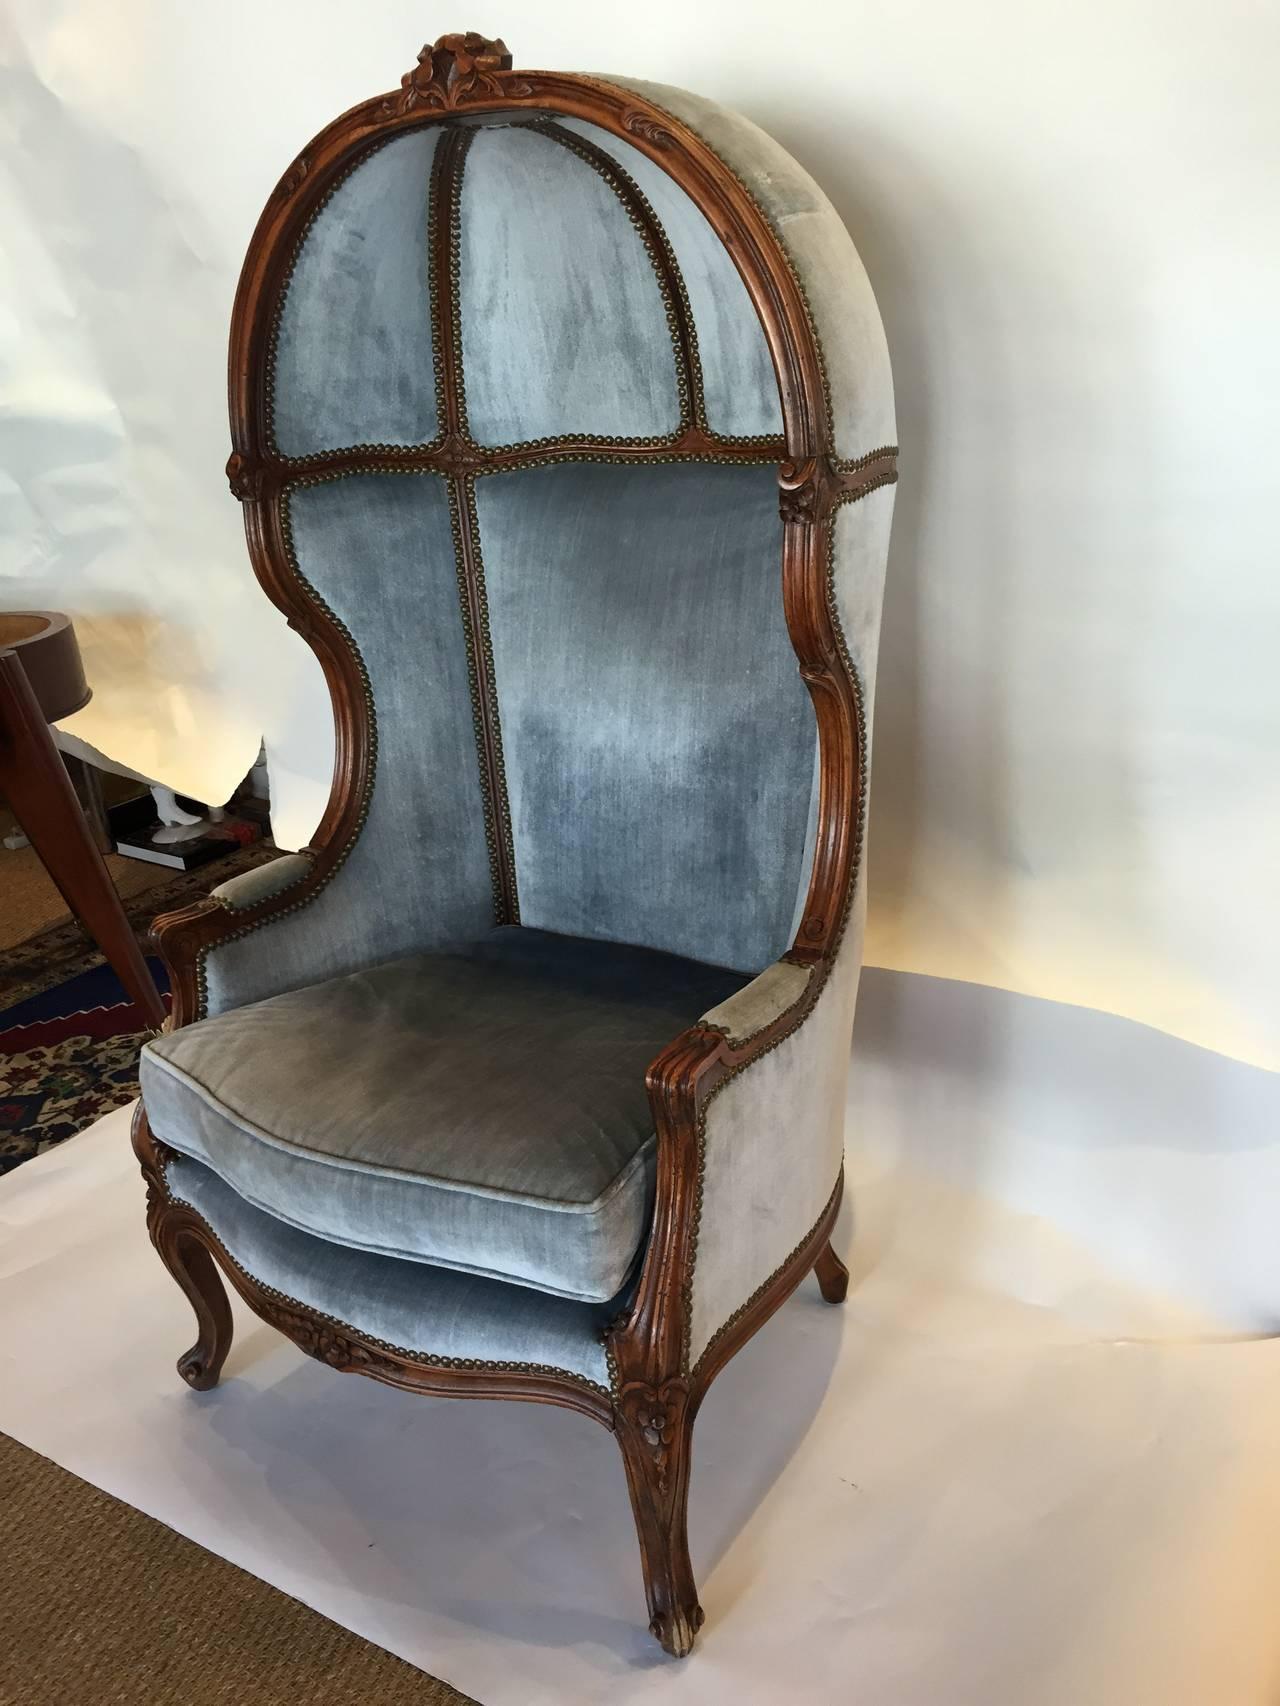 Vintage Porter S Chair For Sale At 1stdibs